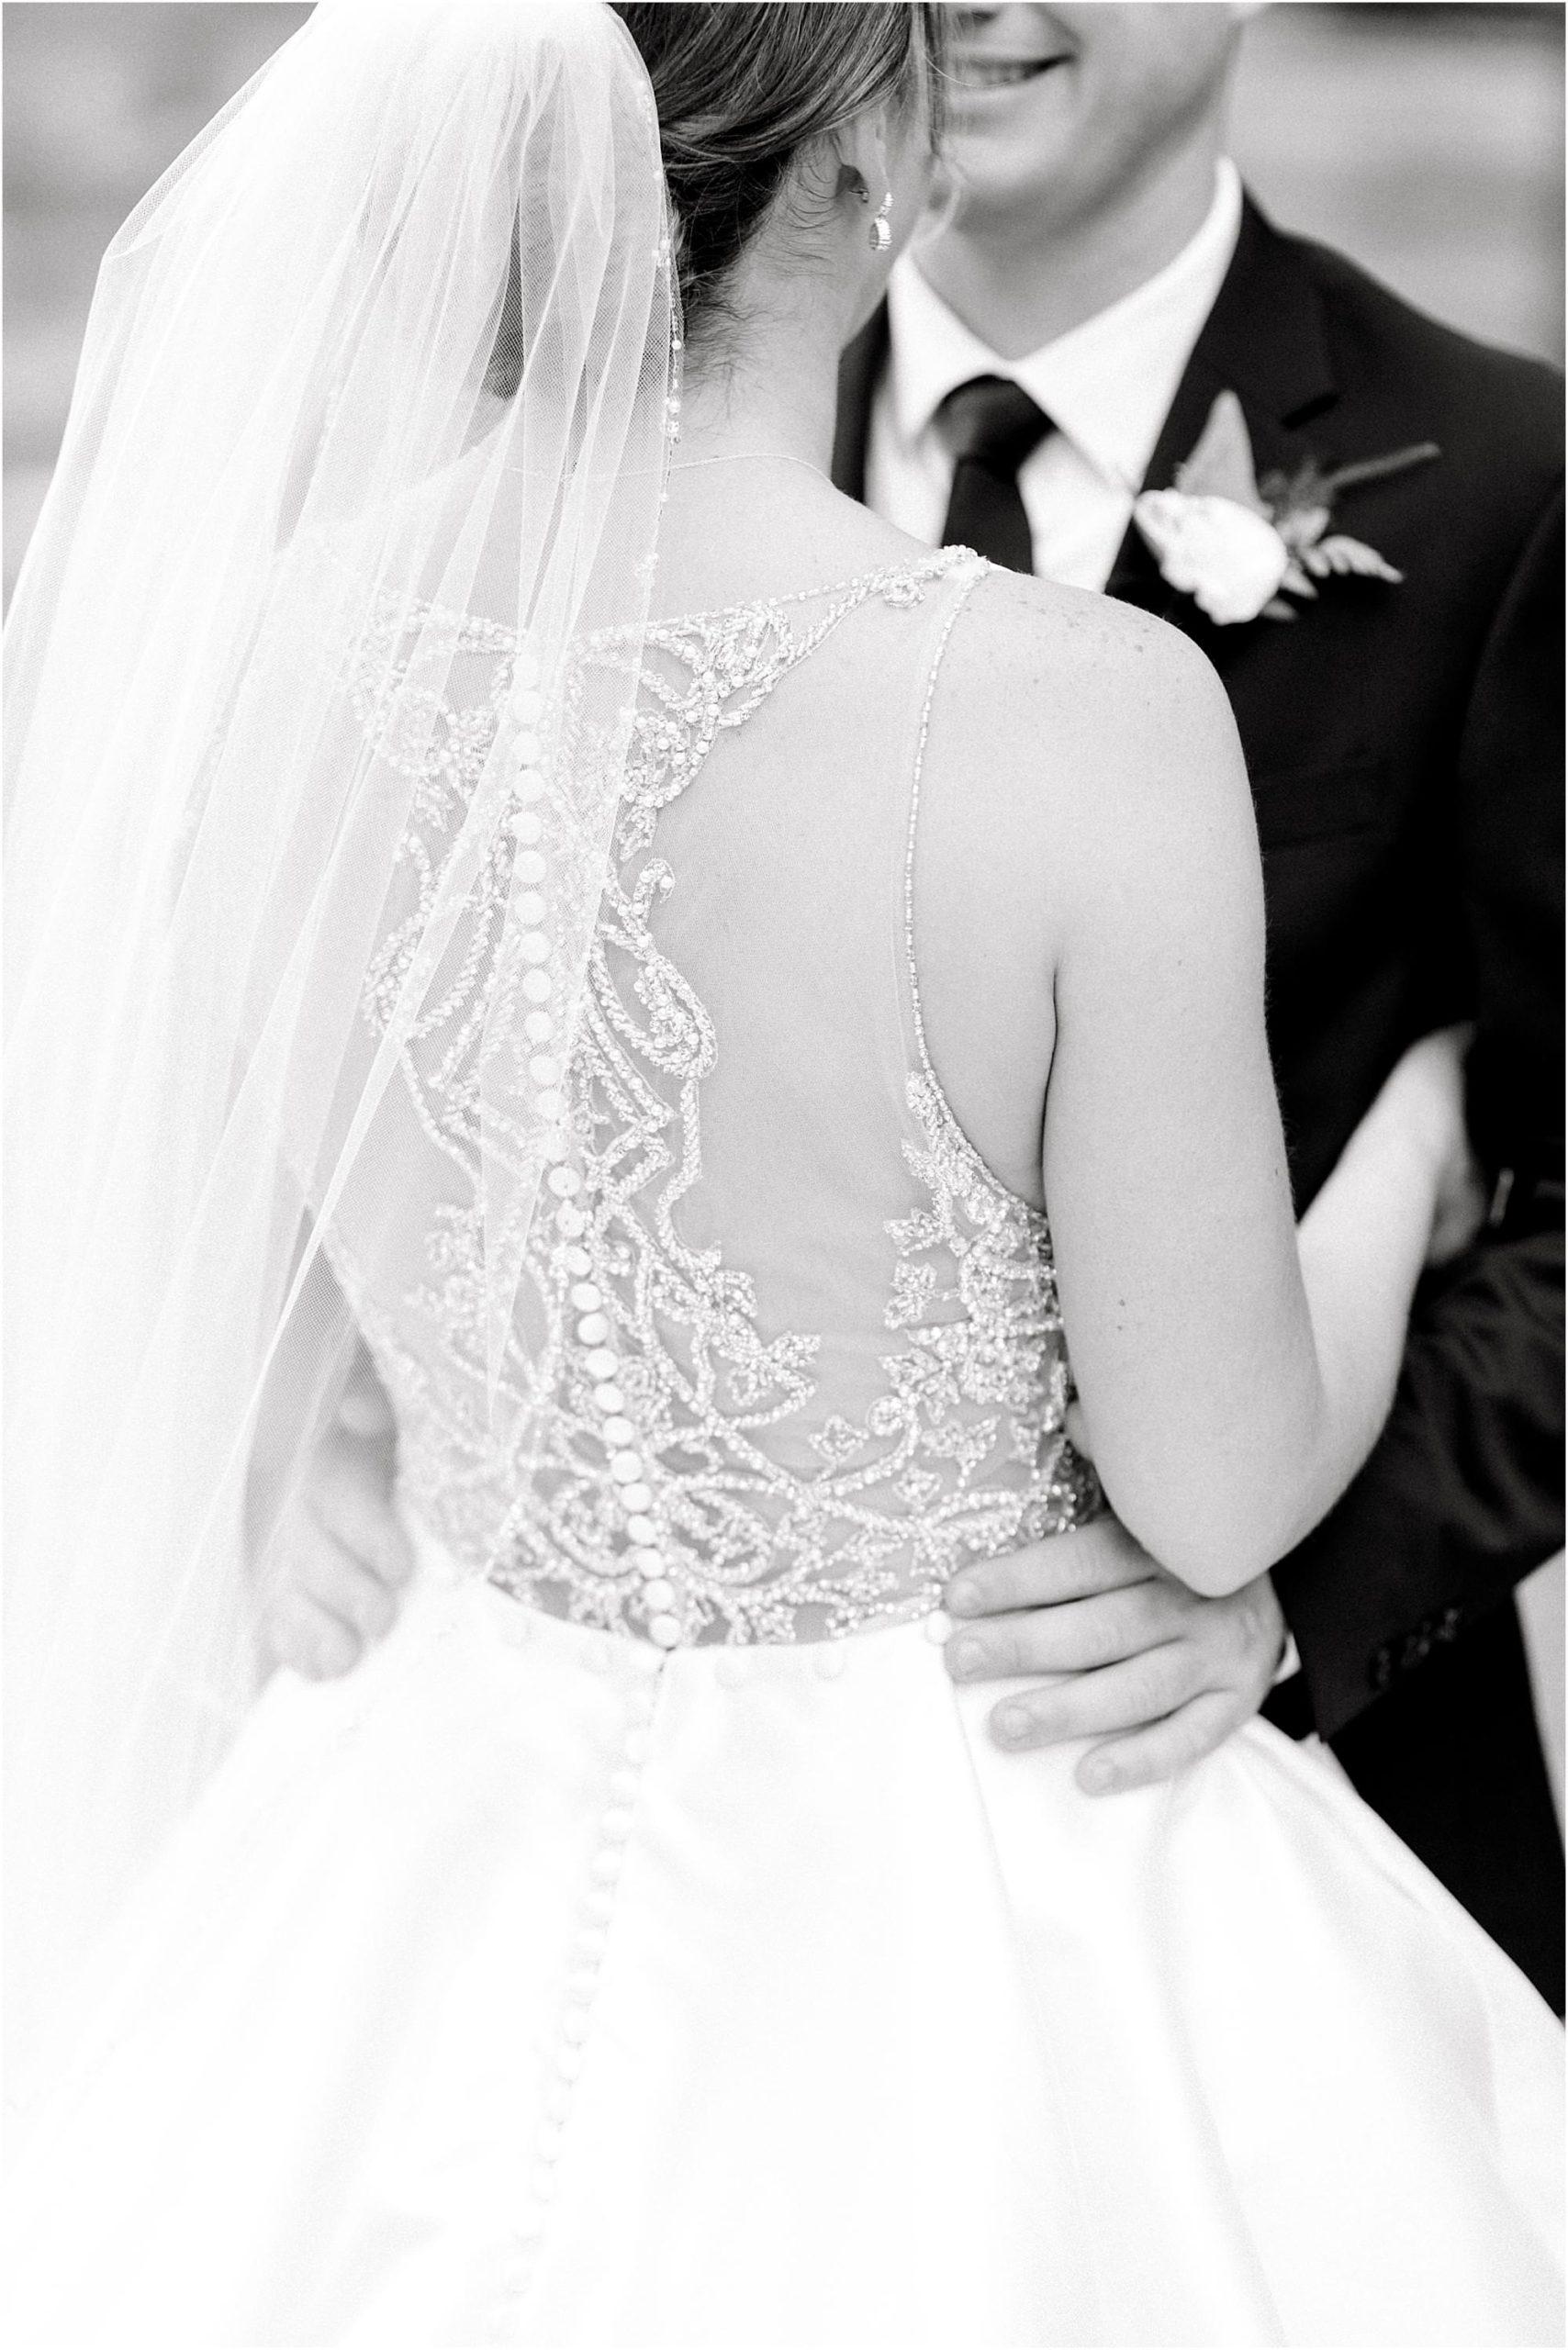 Justin Alexander wedding dress details